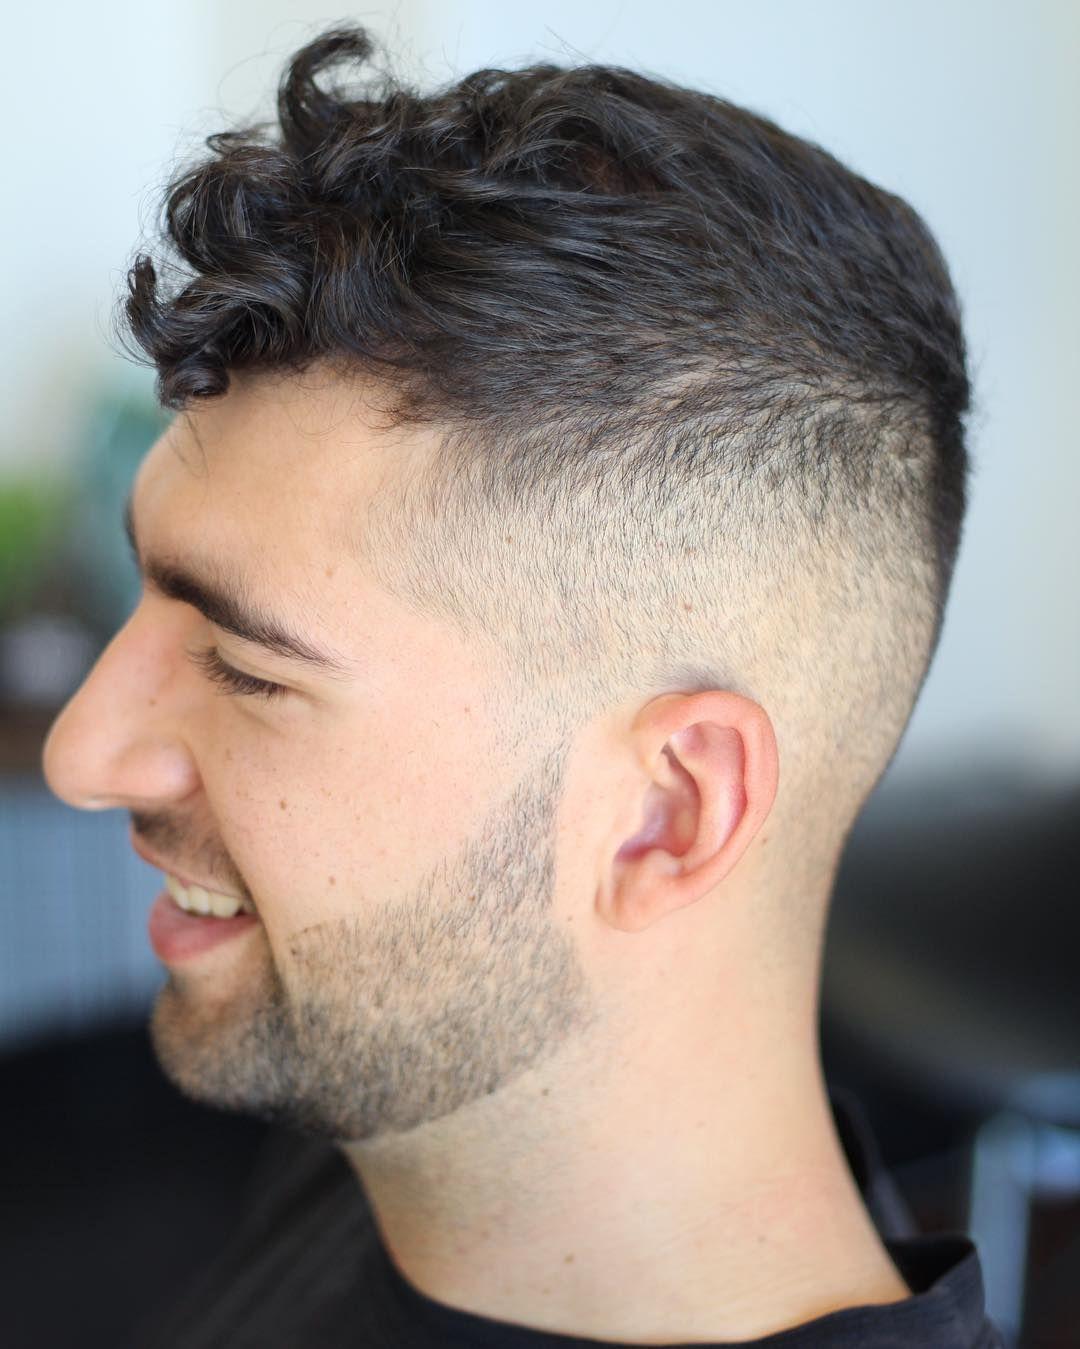 100 New Men S Hairstyles Top Picks Mens Haircuts Short Hair Mens Hairstyles Short New Men Hairstyles